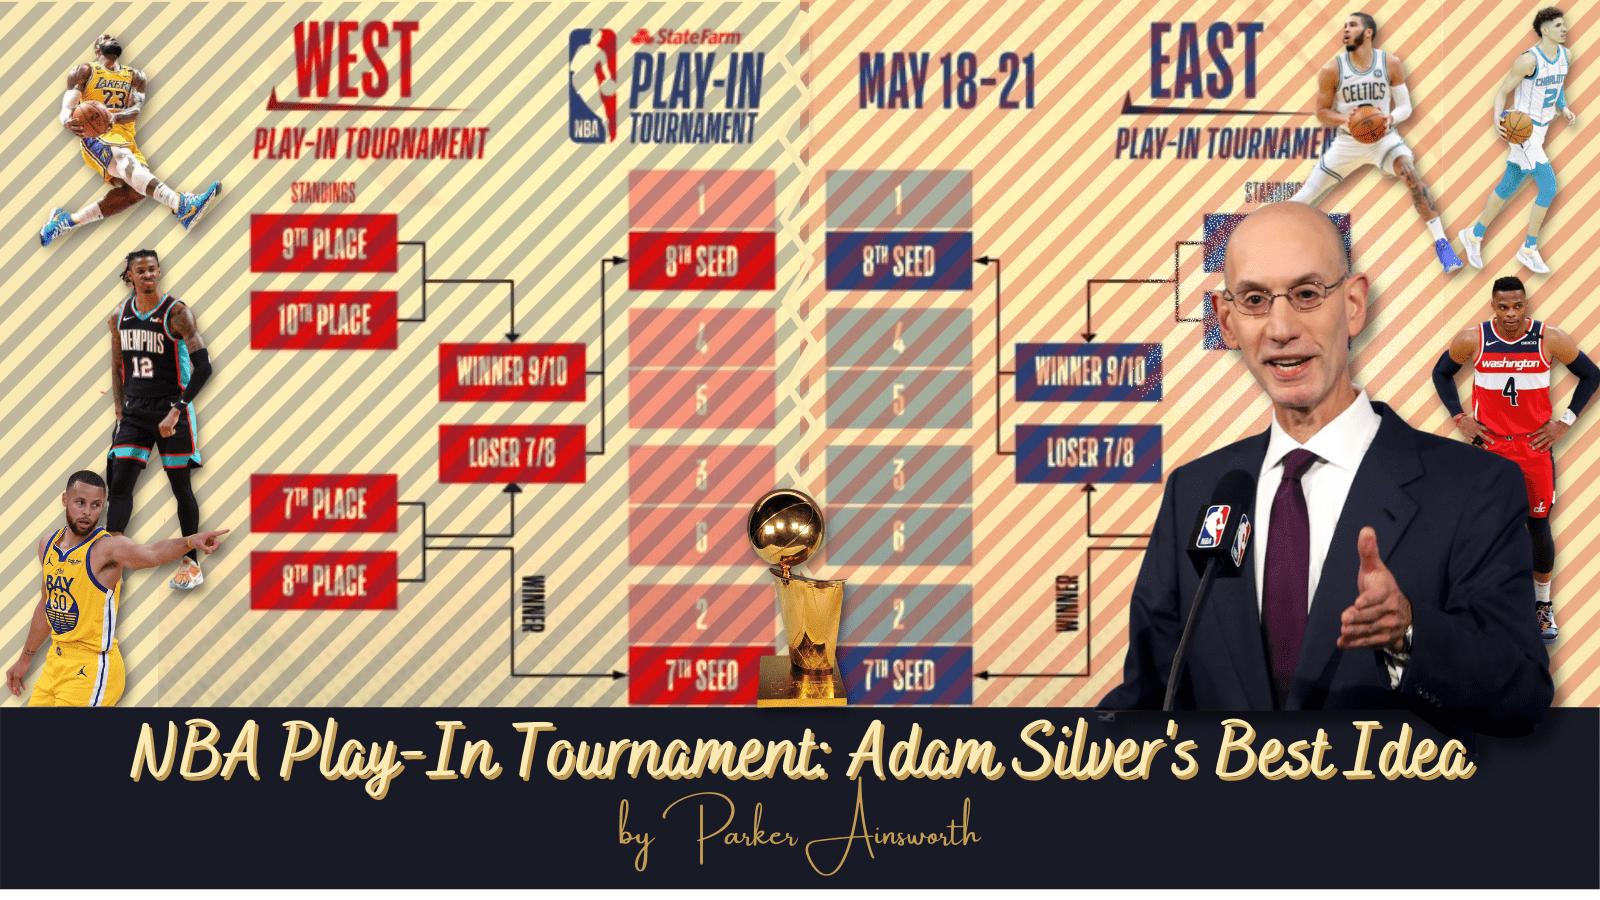 NBA Play-In Tournament: Adam Silver's Best Idea